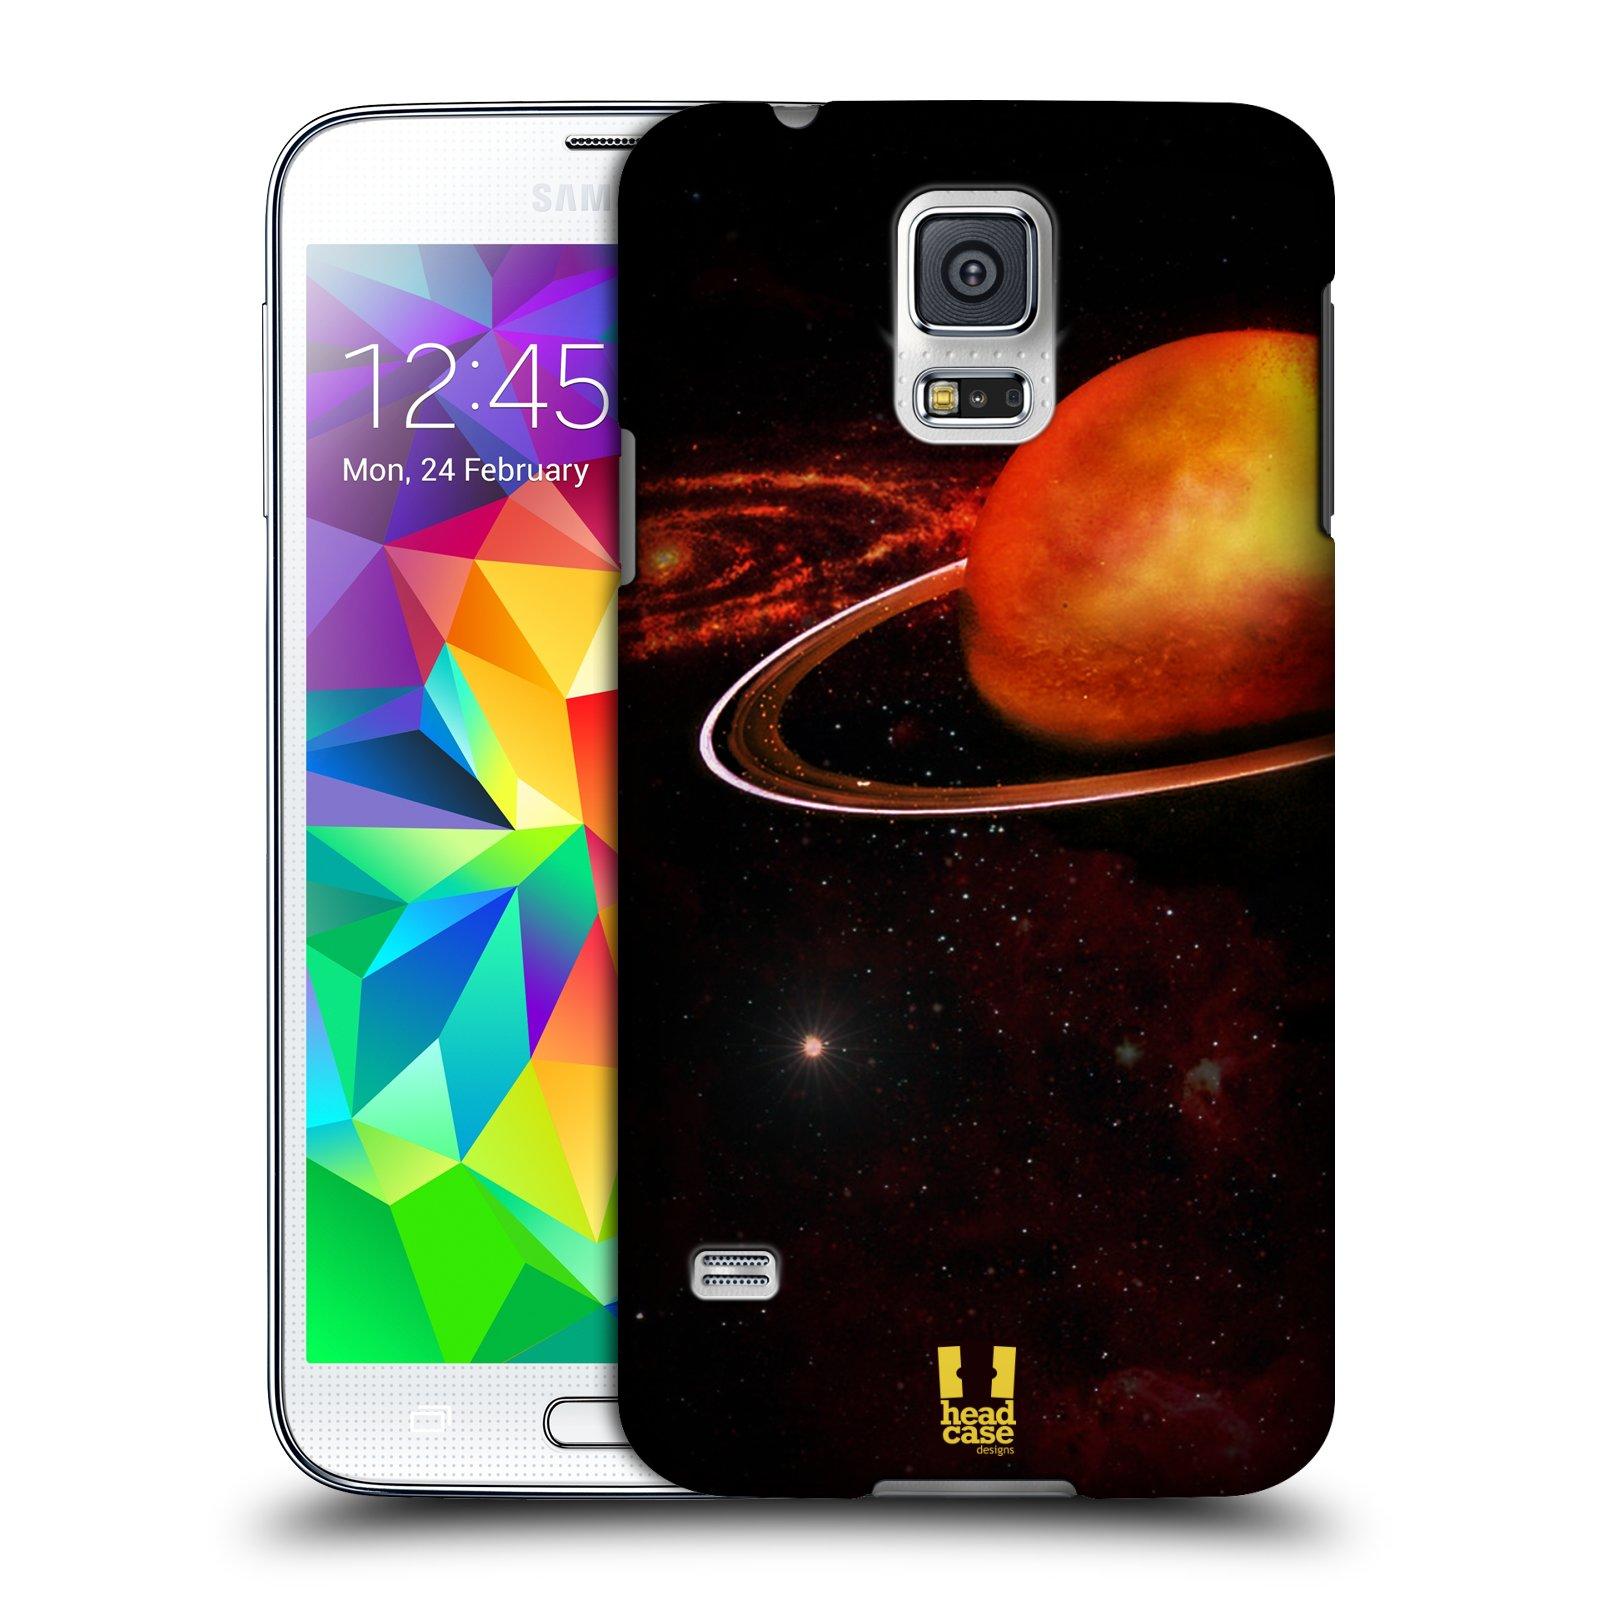 HEAD-CASE-DESIGNS-SPACE-WONDERS-SET-2-HARD-BACK-CASE-FOR-SAMSUNG-GALAXY-S5